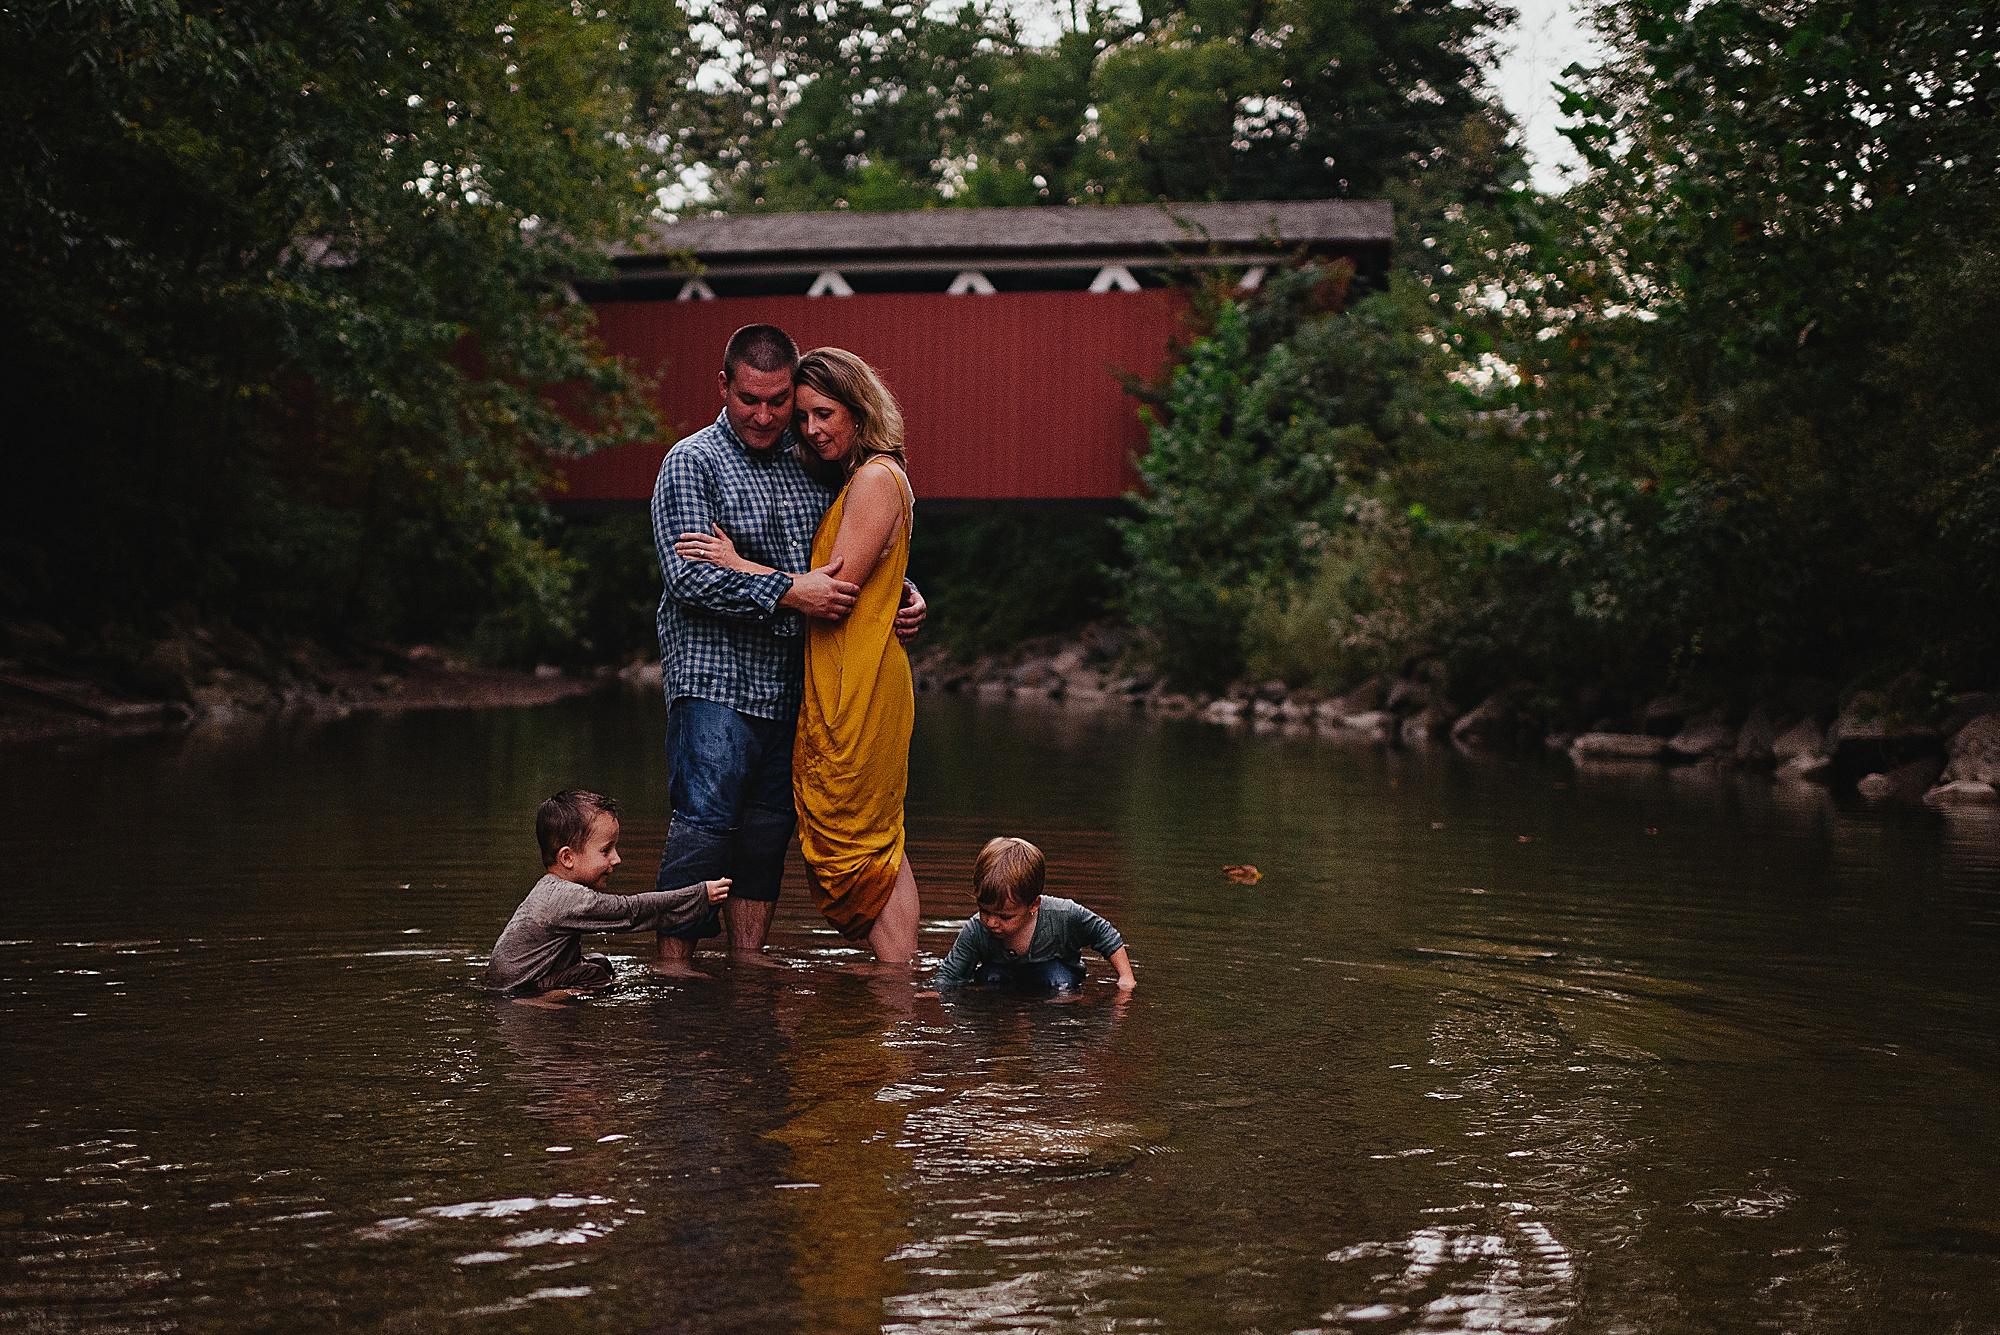 lauren-grayson-photography-akron-ohio-best-family-photos-2018-cleveland_0018.jpg